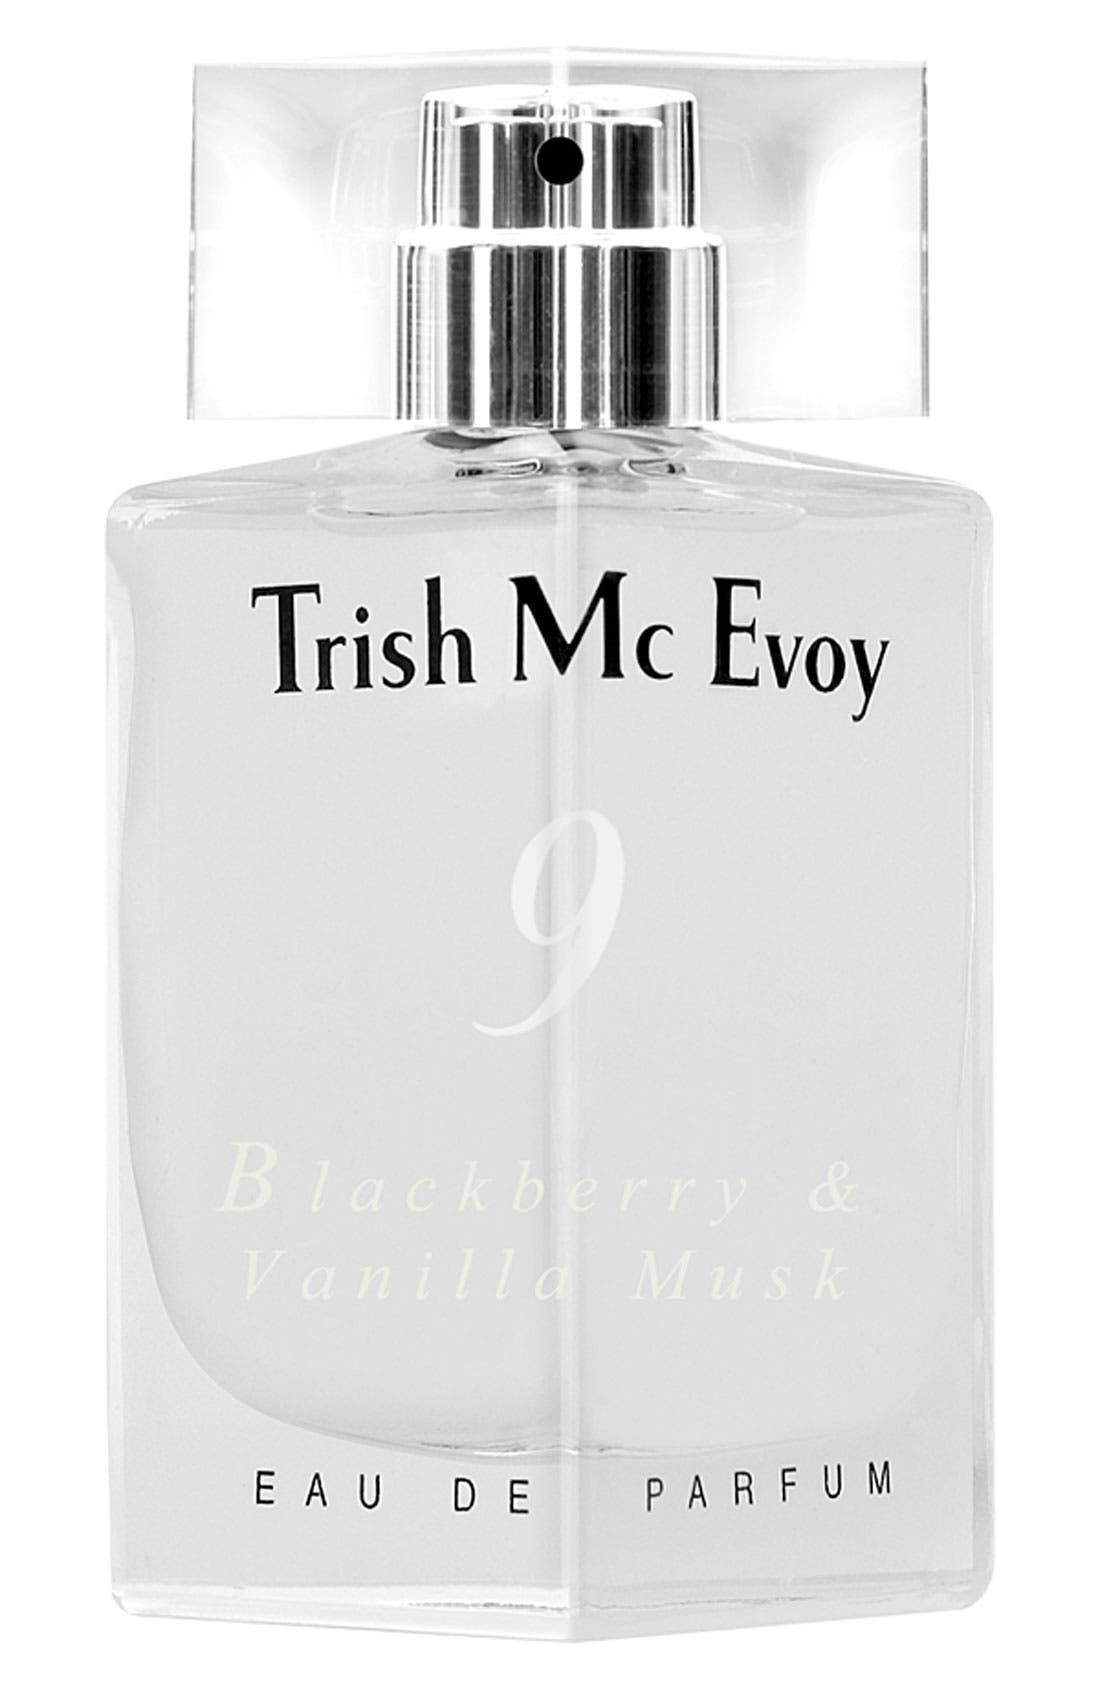 Trish McEvoy No. 9 Blackberry & Vanilla Musk Eau de Parfum